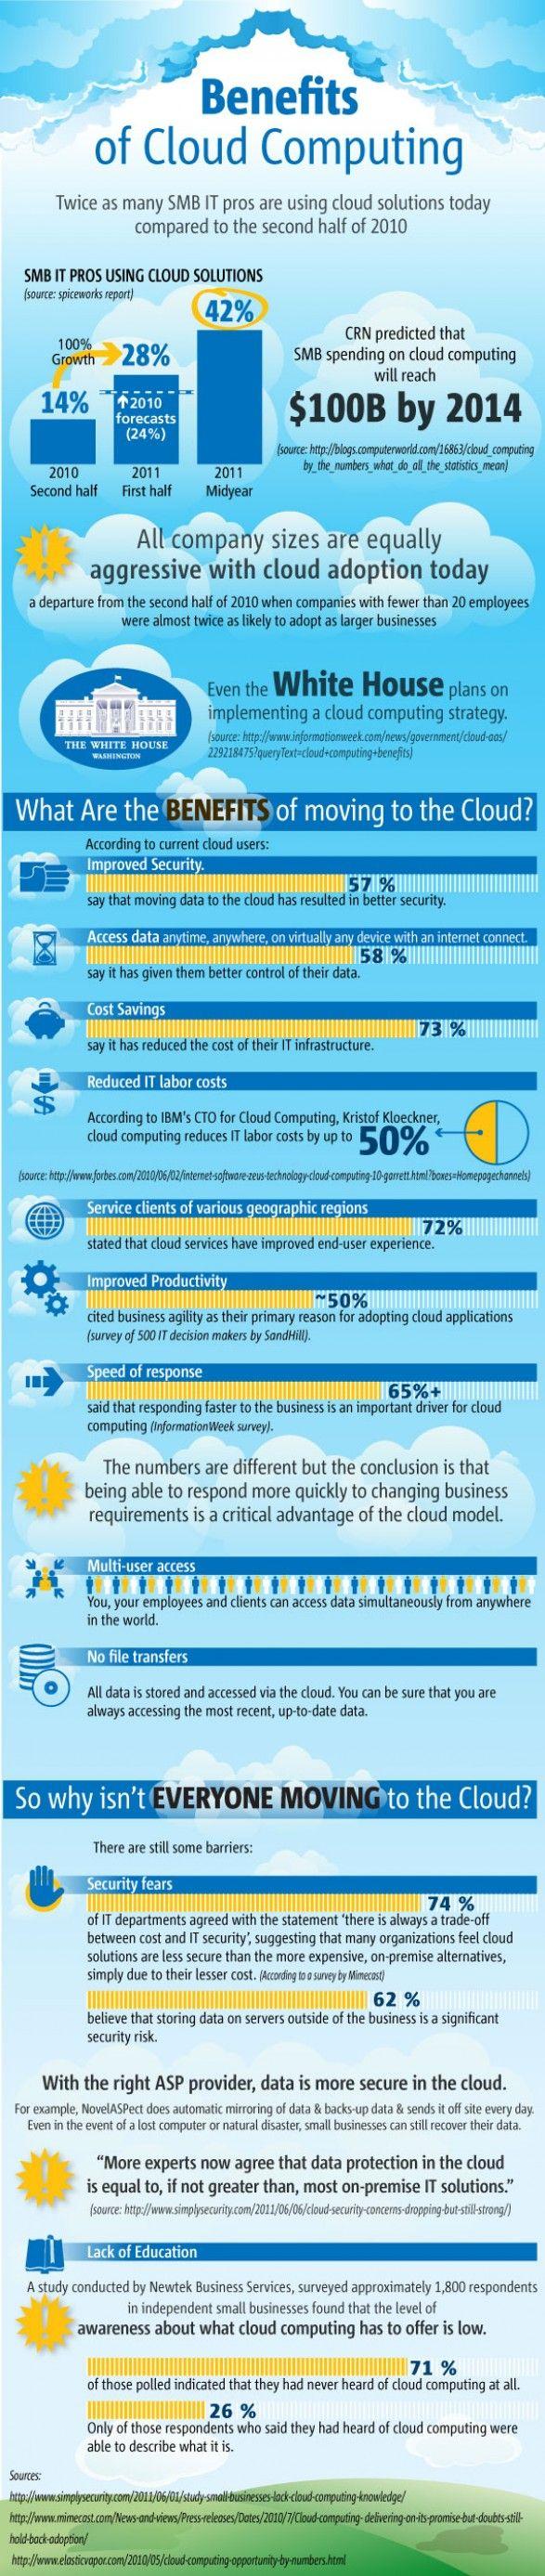 Beneficis del Cloud Computing